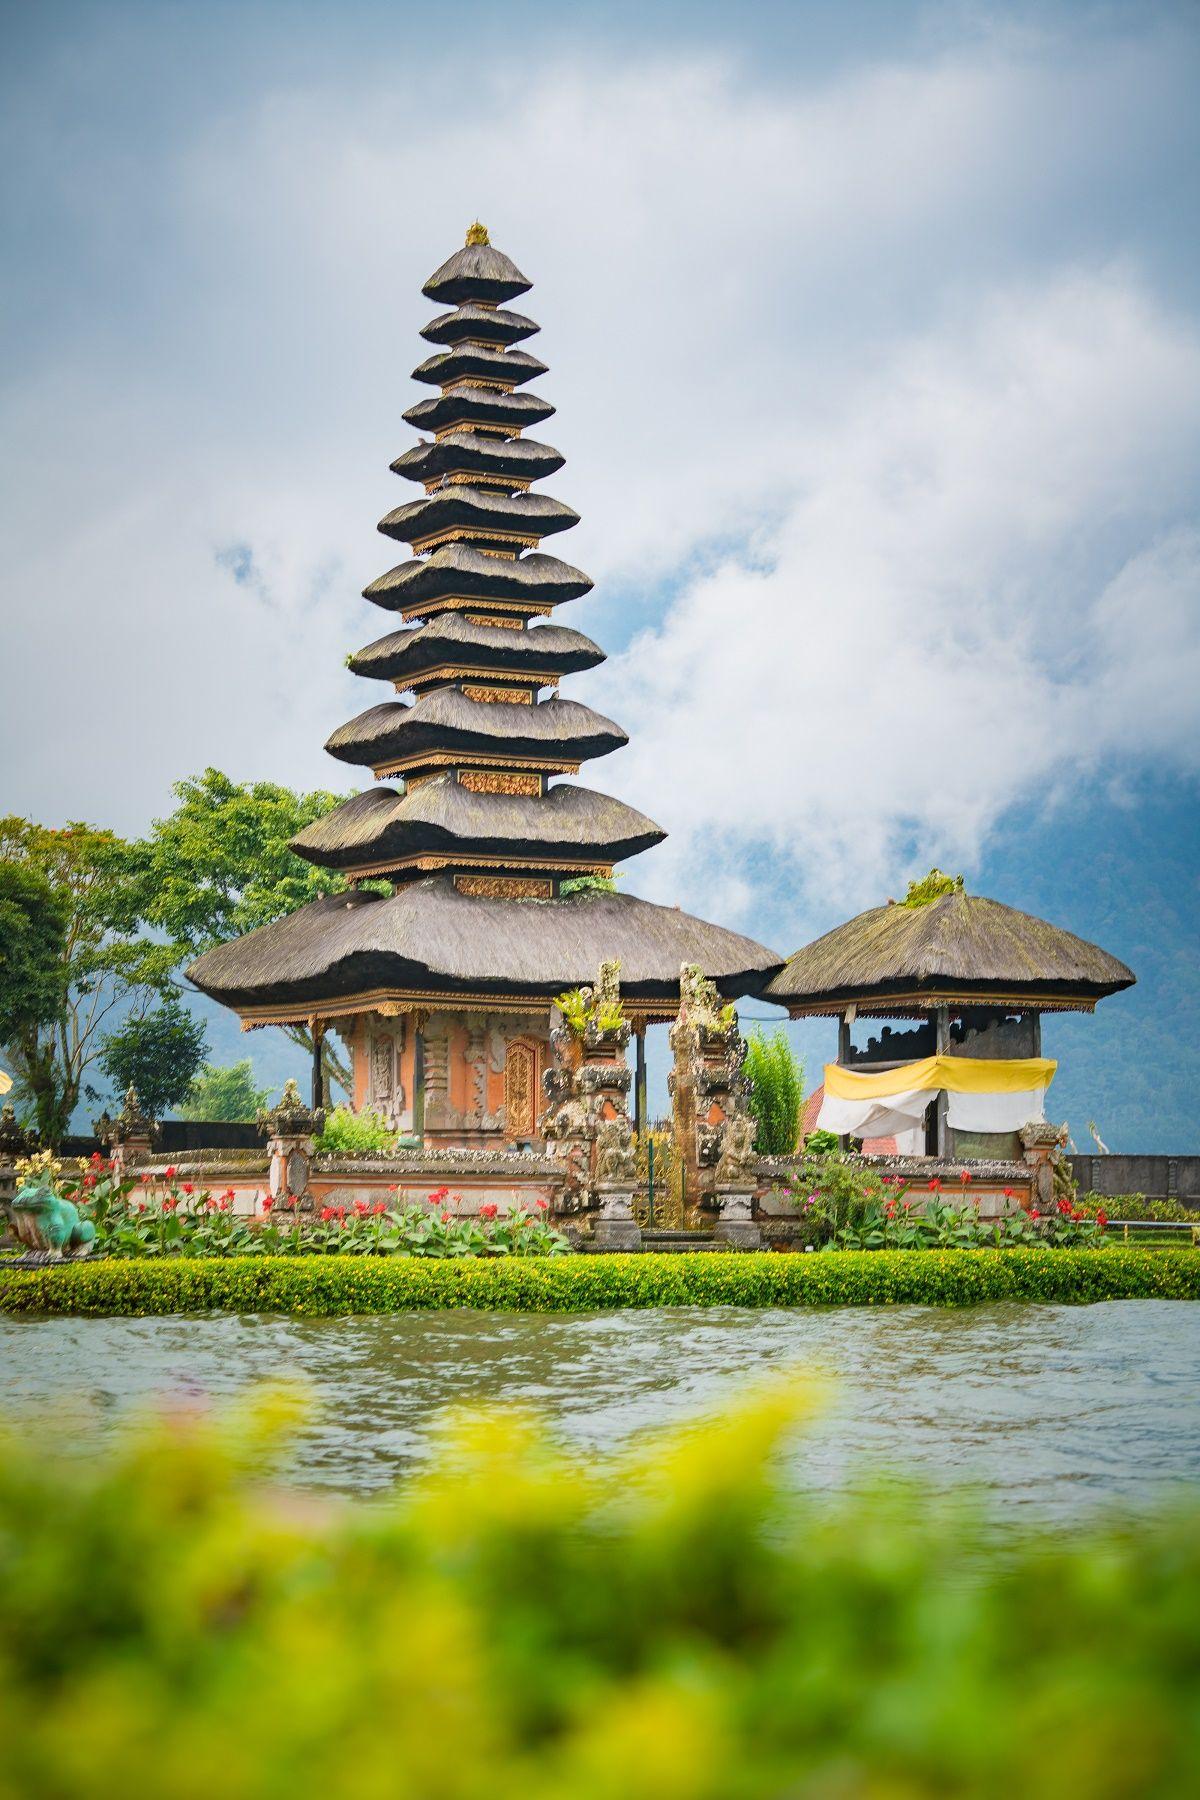 Pura Ulun Danu Bratan Points Of Interest In 2020 Water Temple